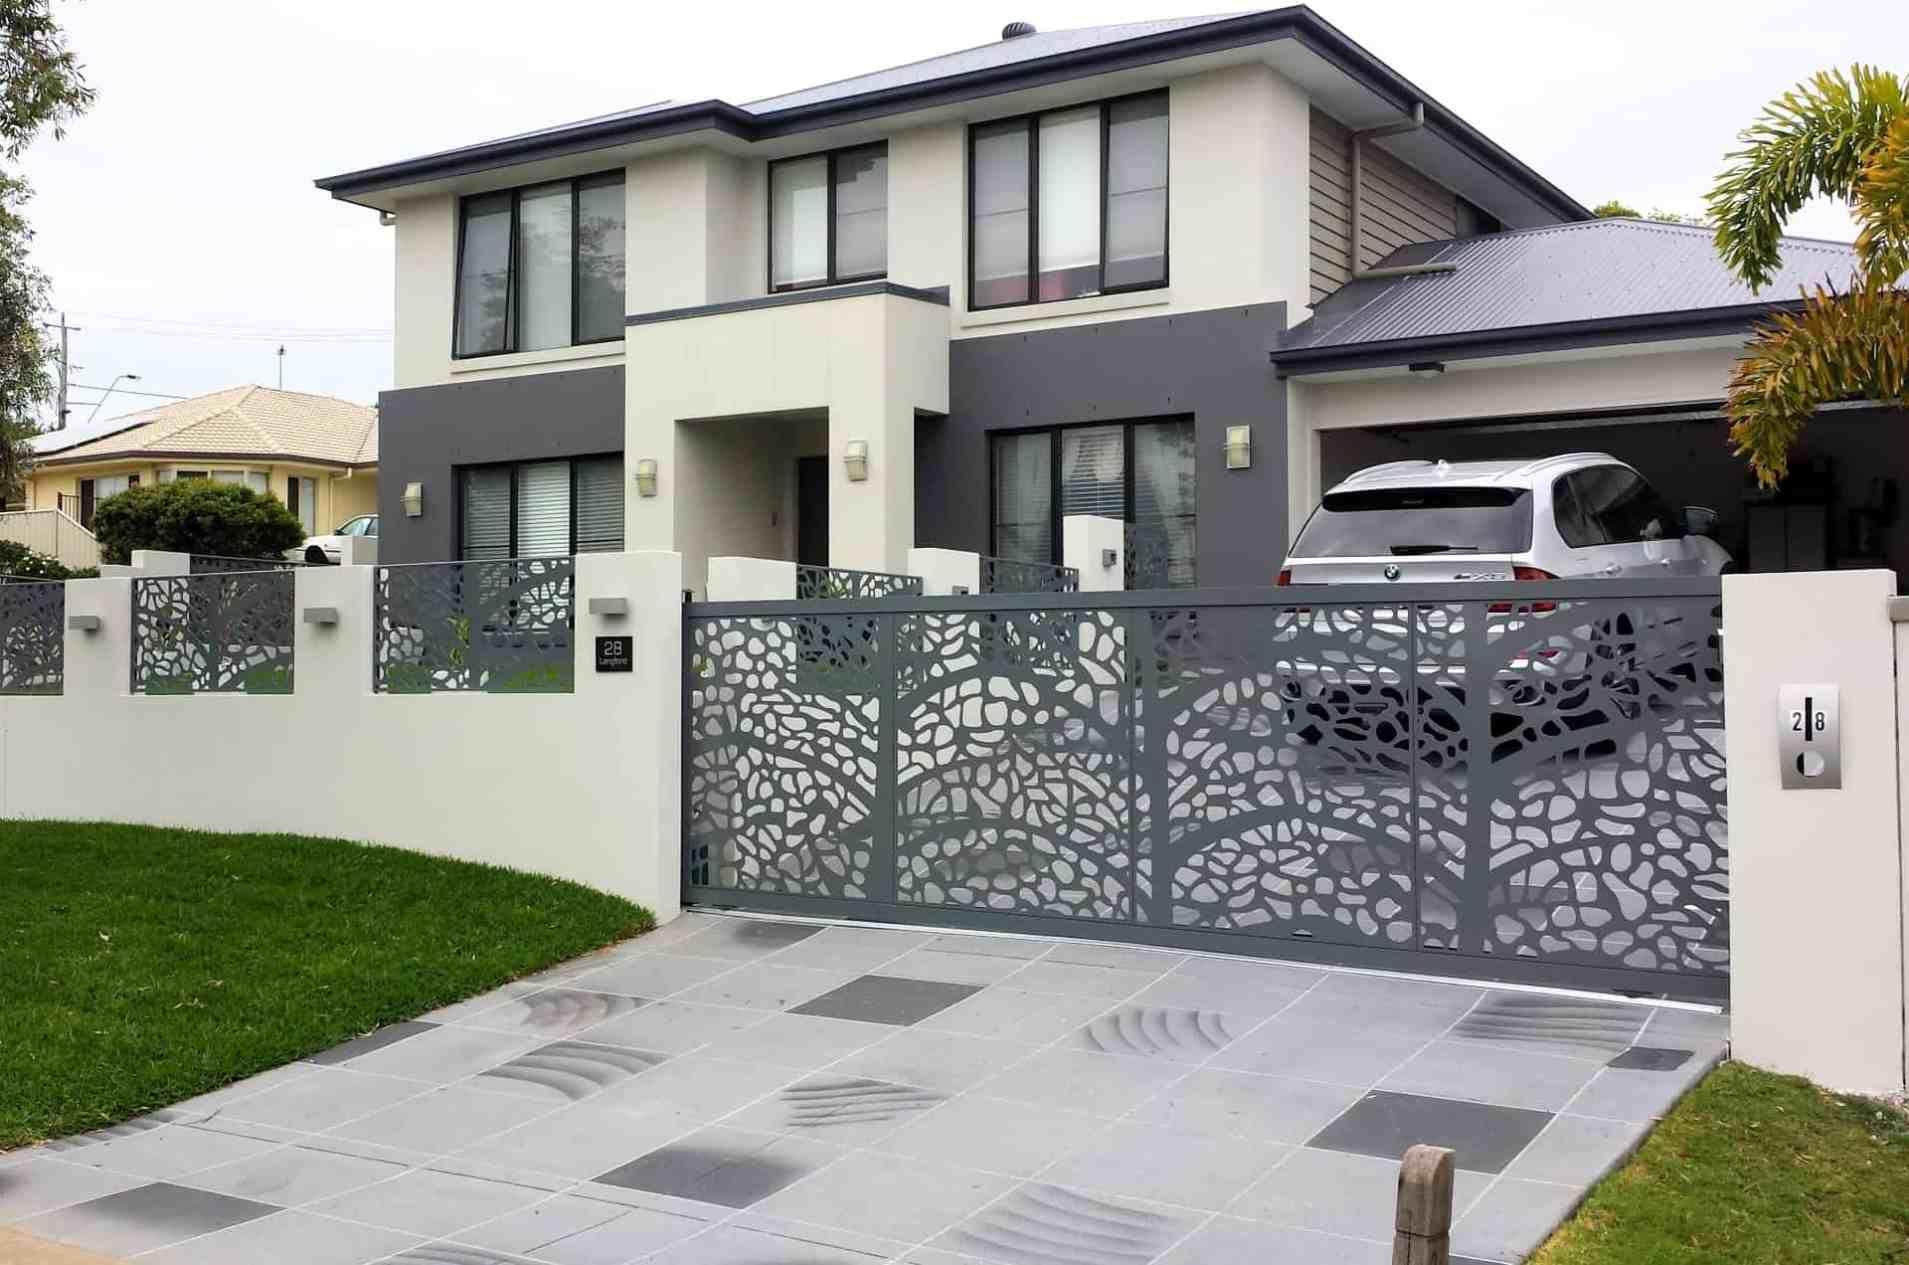 Decorative Entry & Driveway Gates House fence design